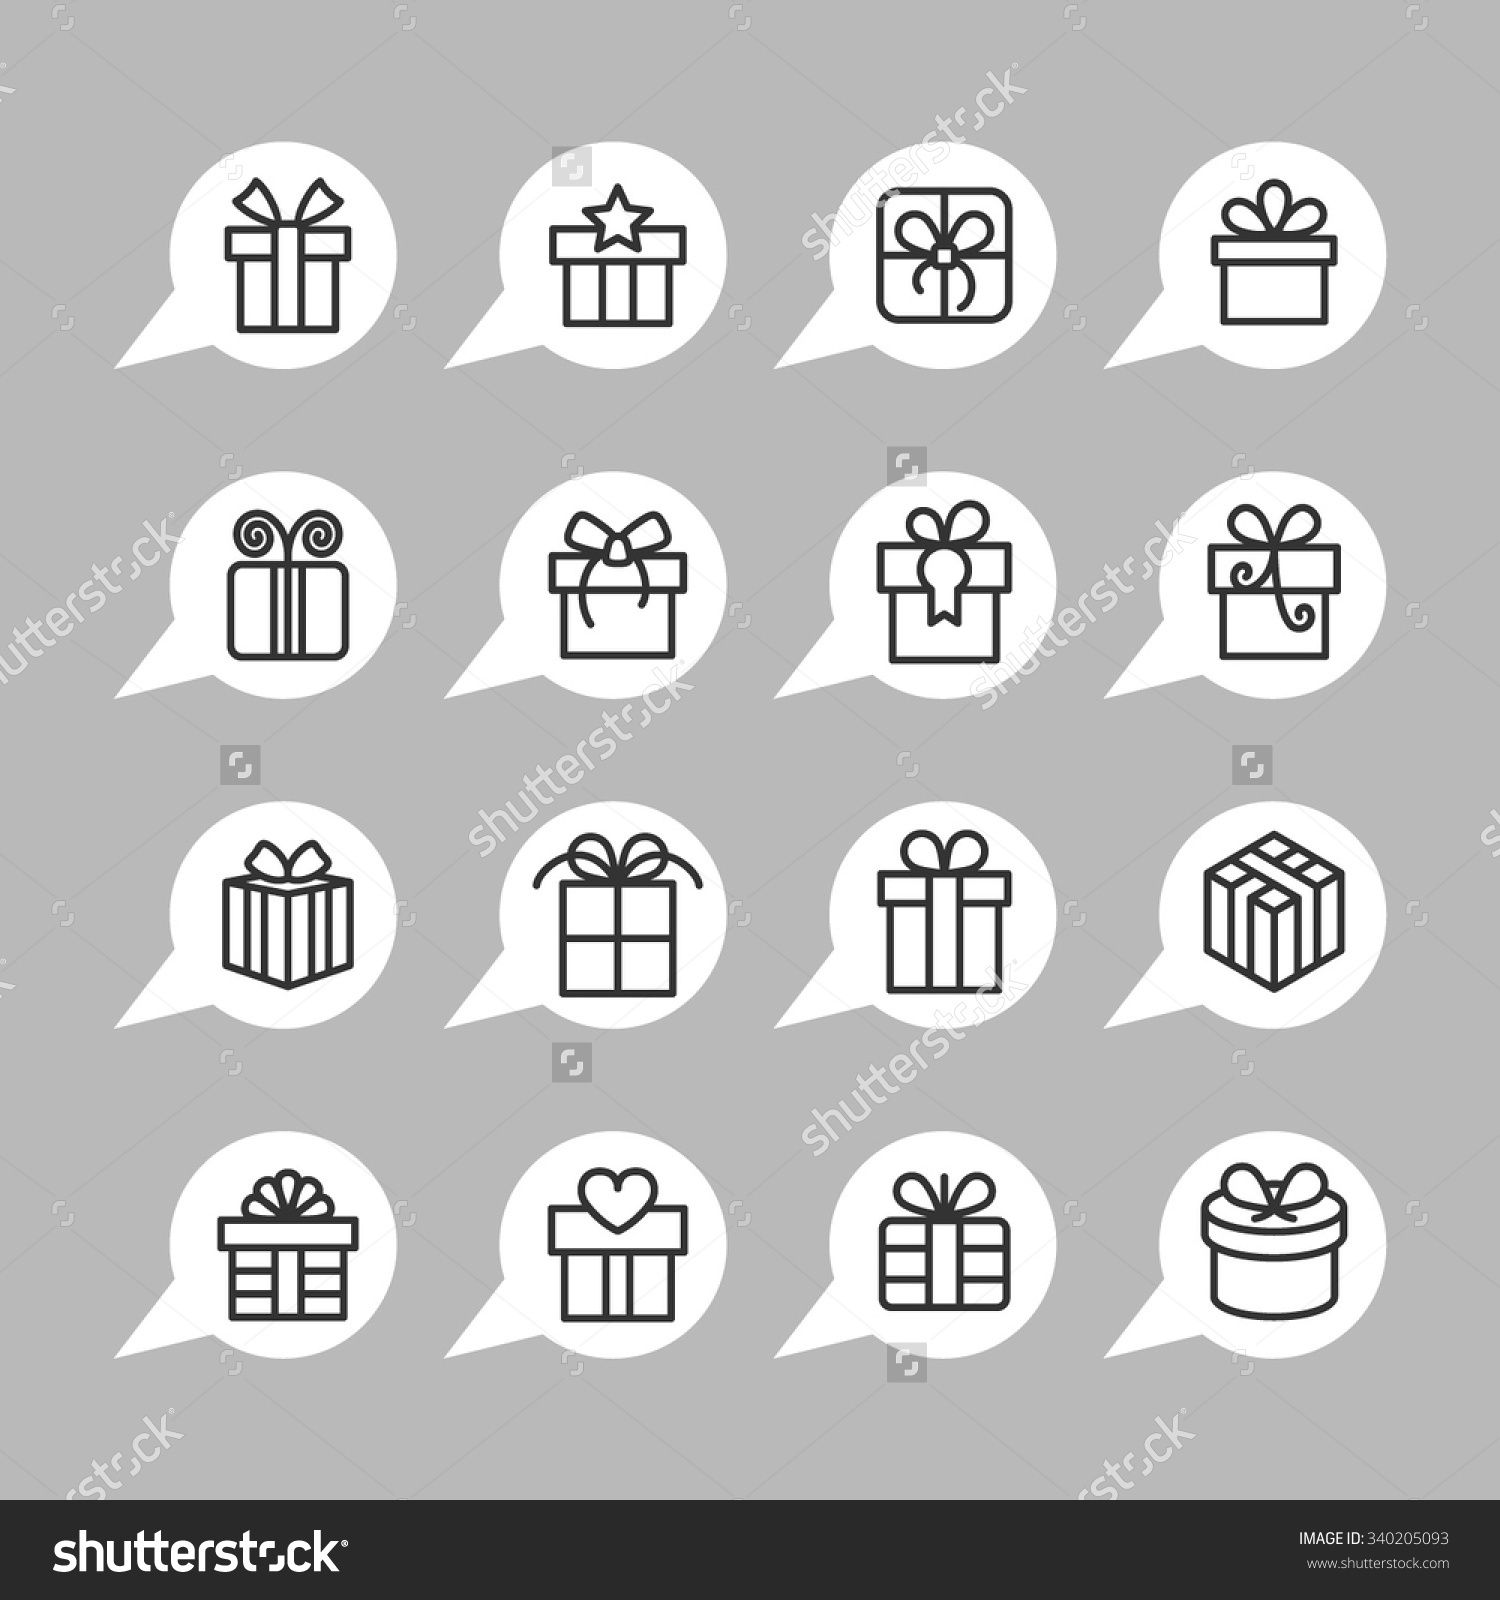 Present icons / Gift icons / Gift box icons / Christmas